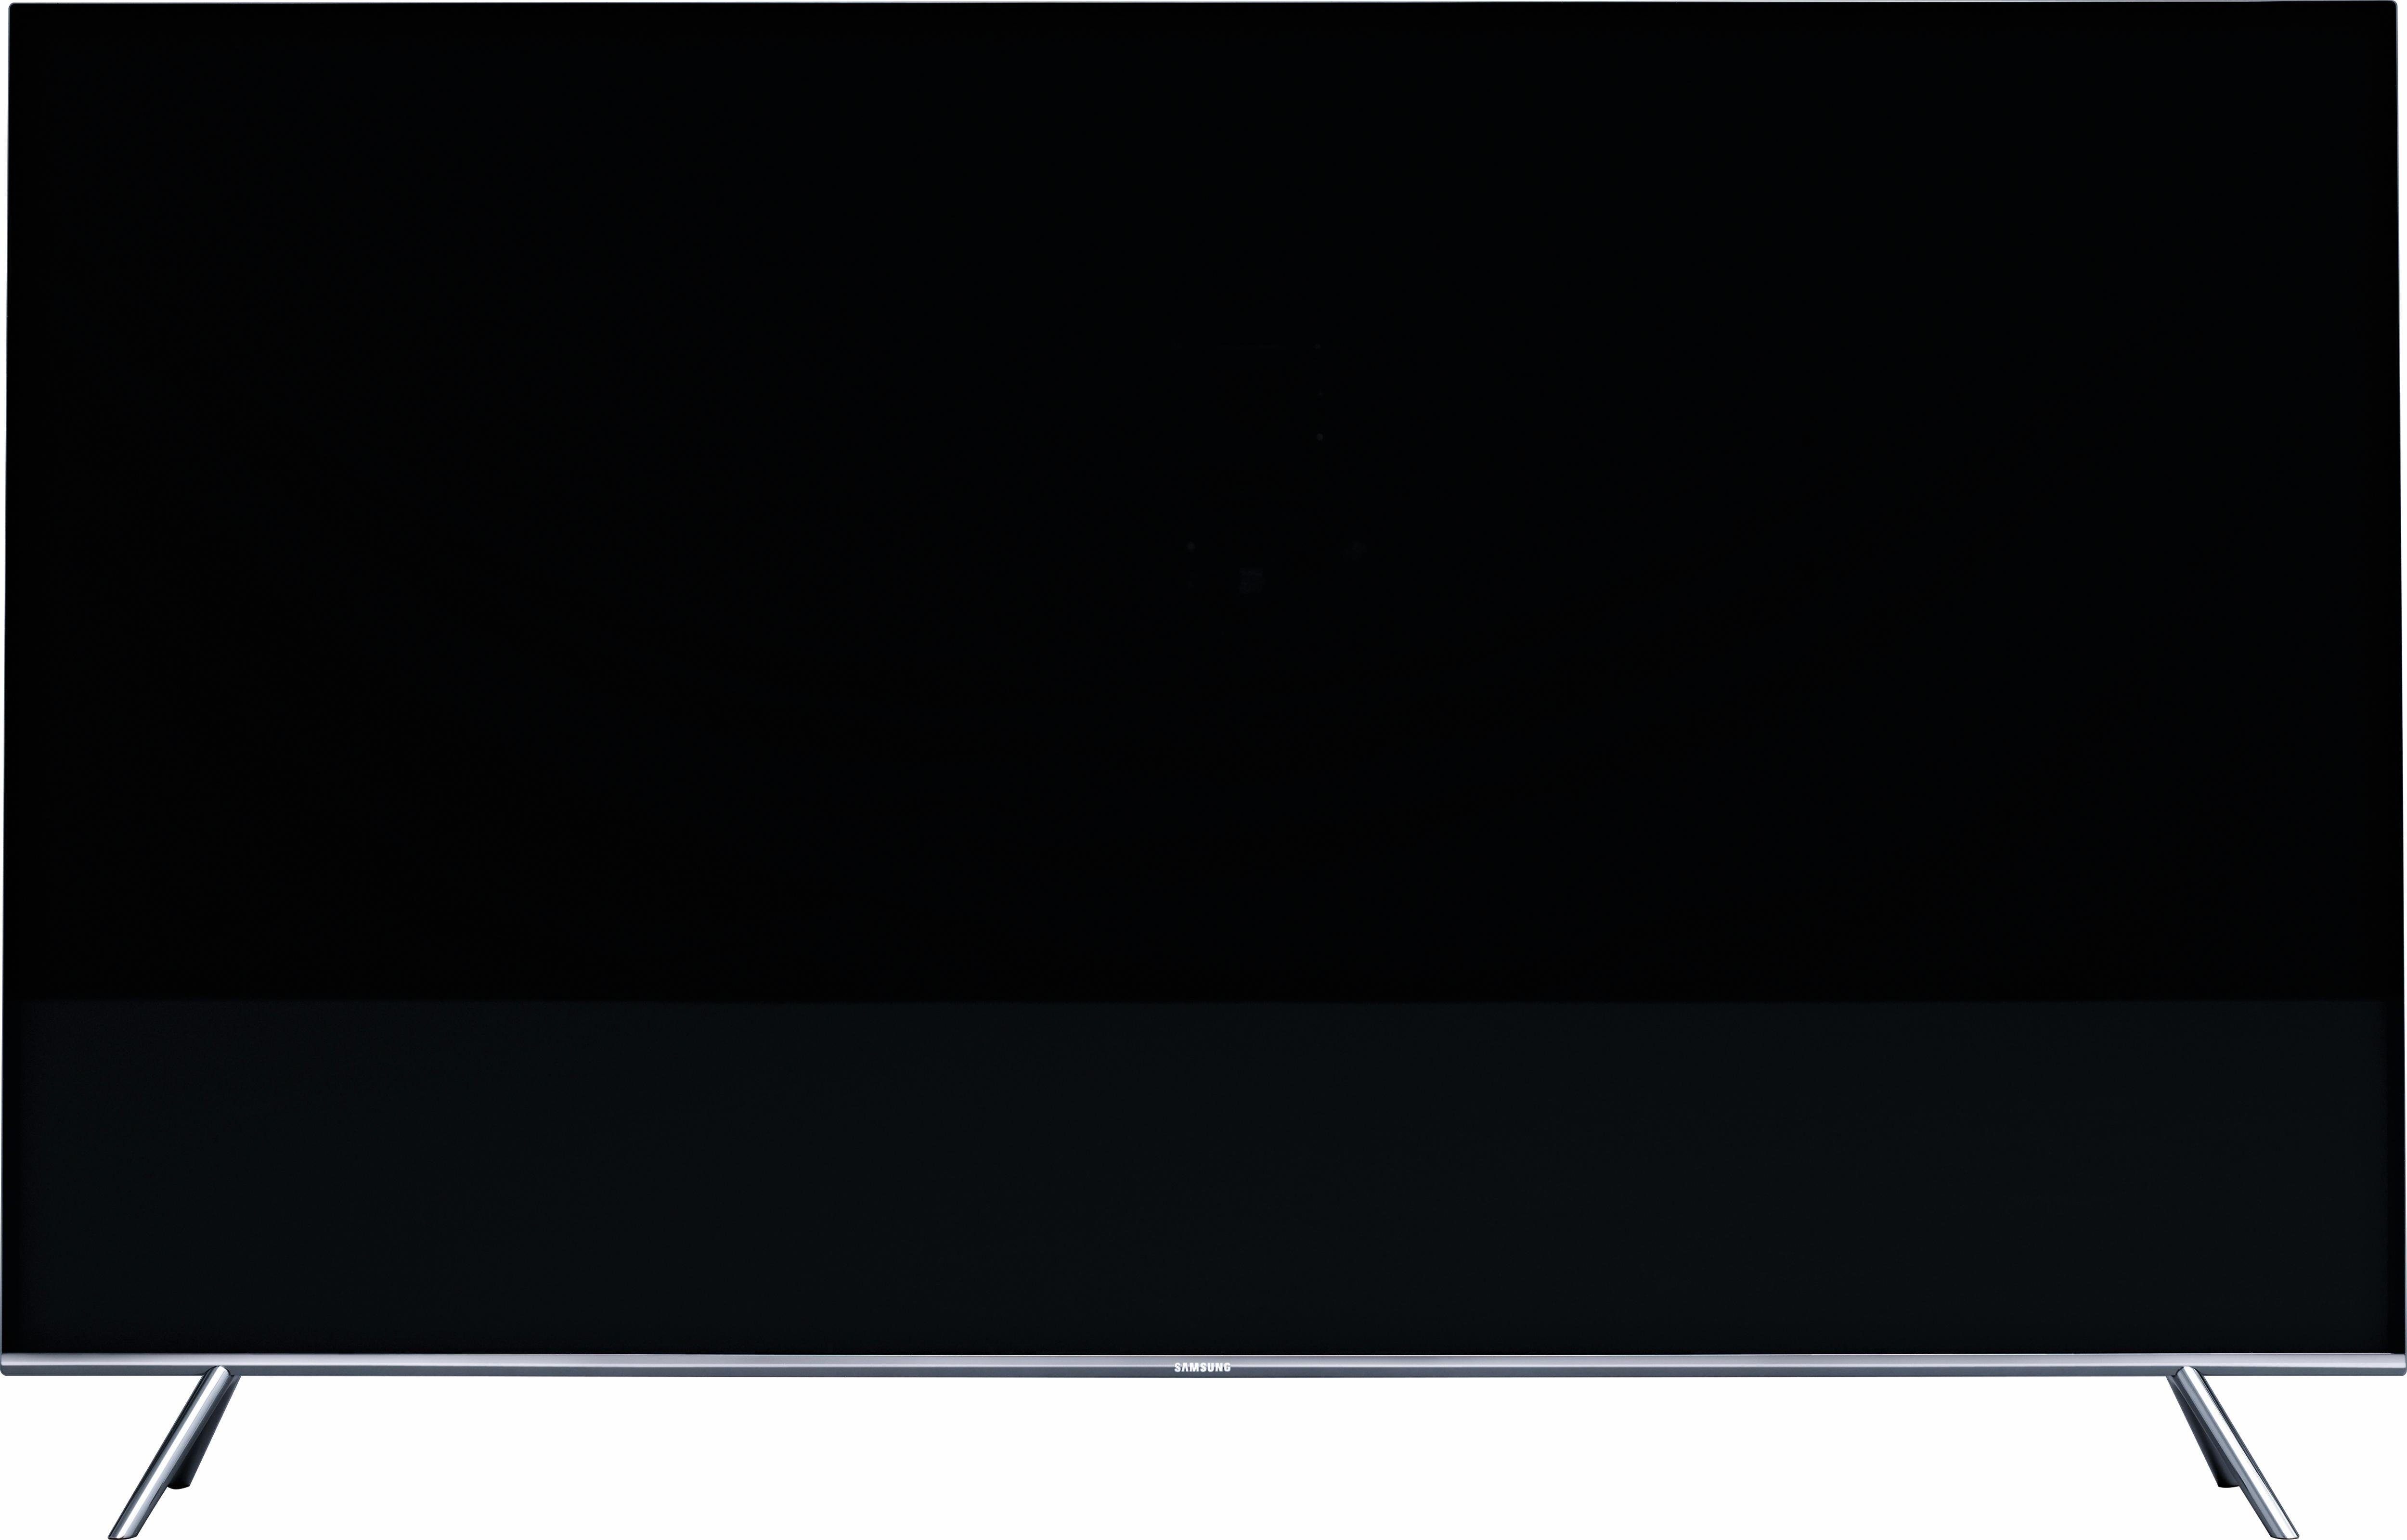 Samsung UE55KS7090UXZG, LED Fernseher, 138 cm (55 Zoll), 2160p (SUHD), Smart-TV